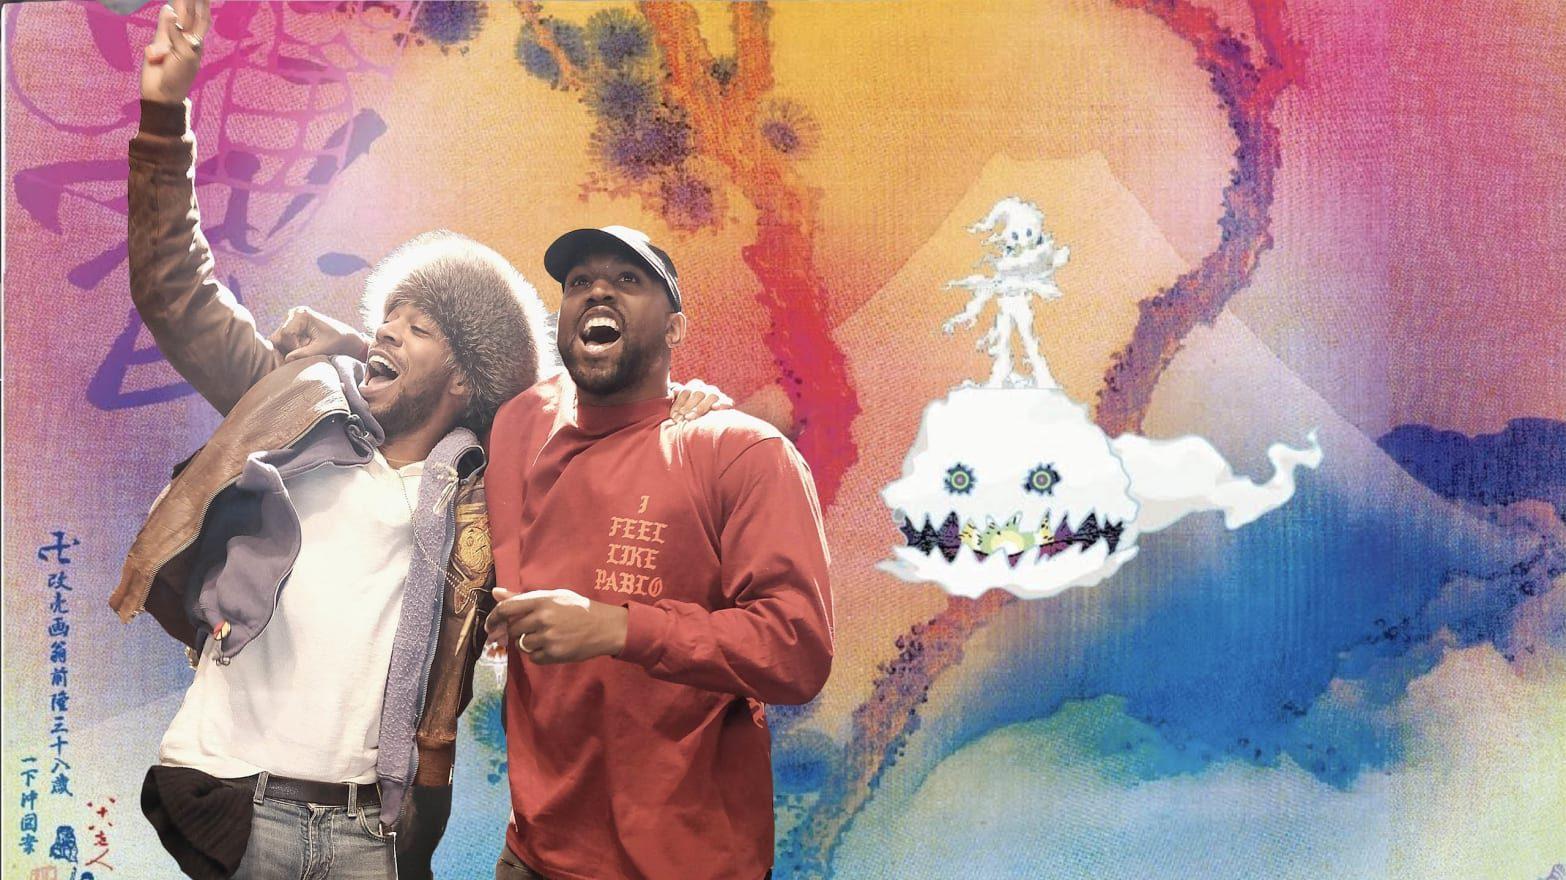 Kanye WestとKid Cudiが『KIDS SEE GHOSTS』でのサンプリングが原因で訴えられる ...